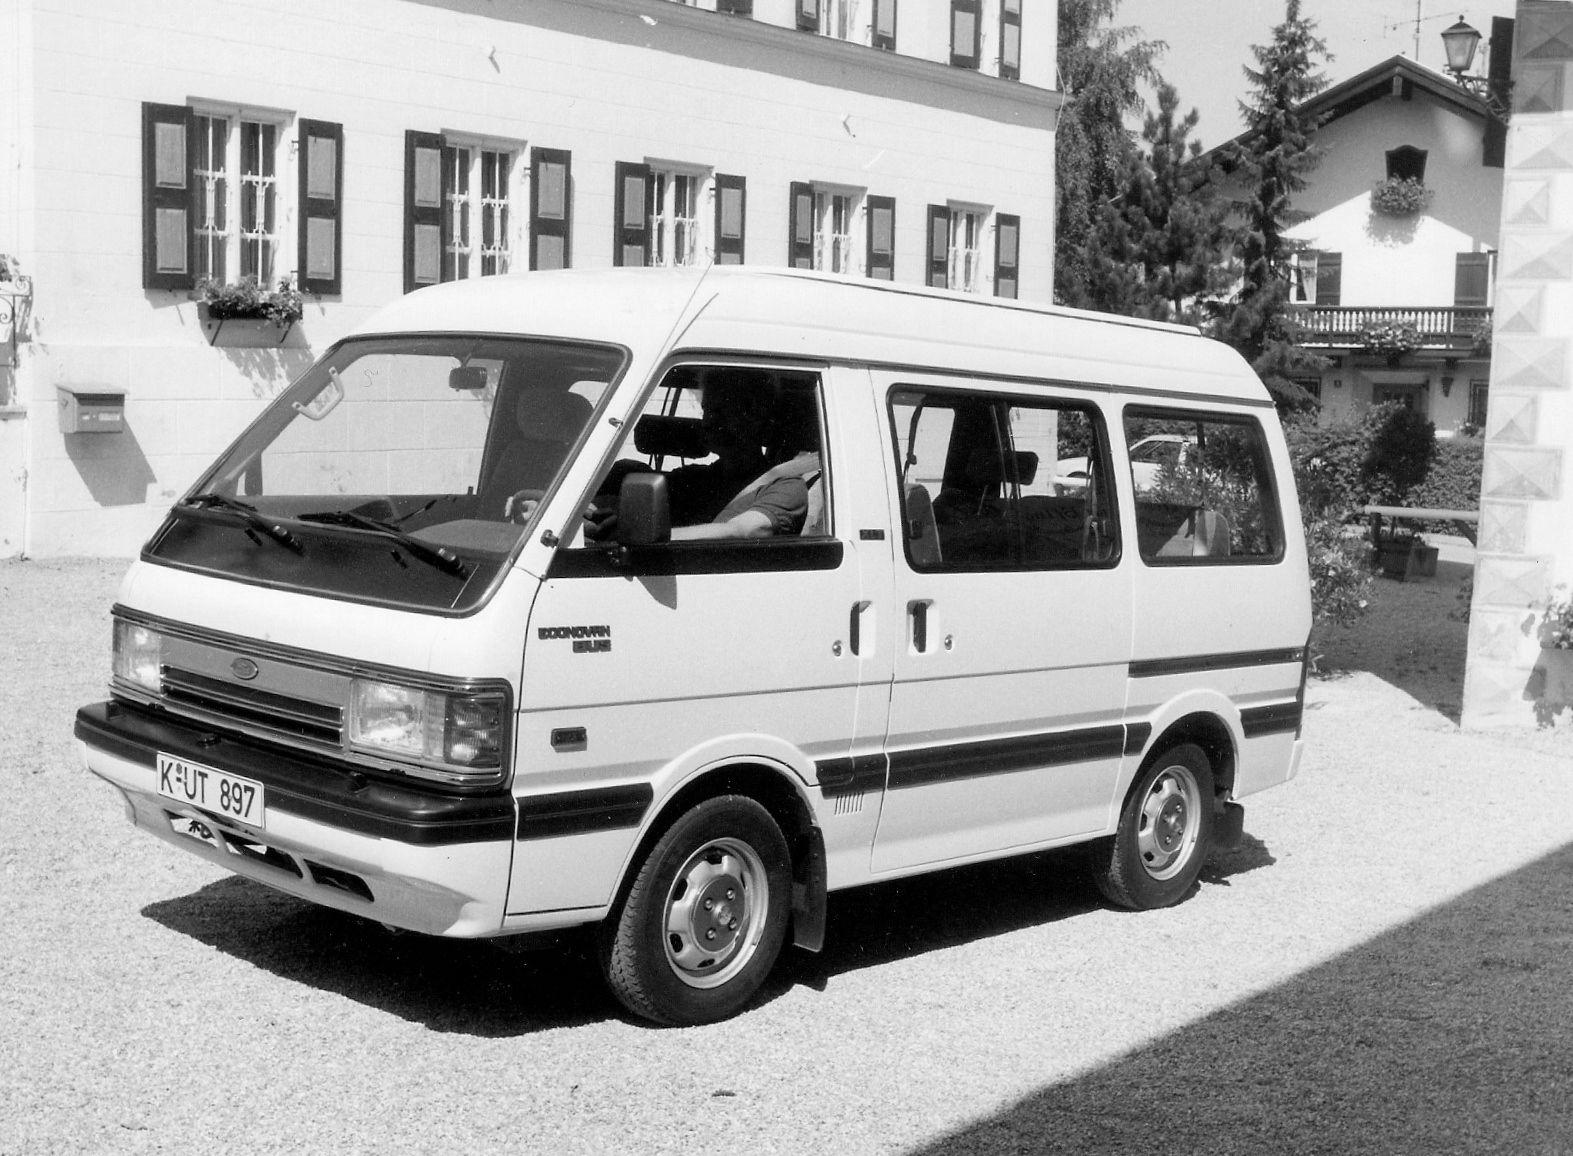 ford econovan xlt bus pressebilder ford iaa 1986 pinterest rh pinterest com Ford Econoline Van Ford Econoline Van